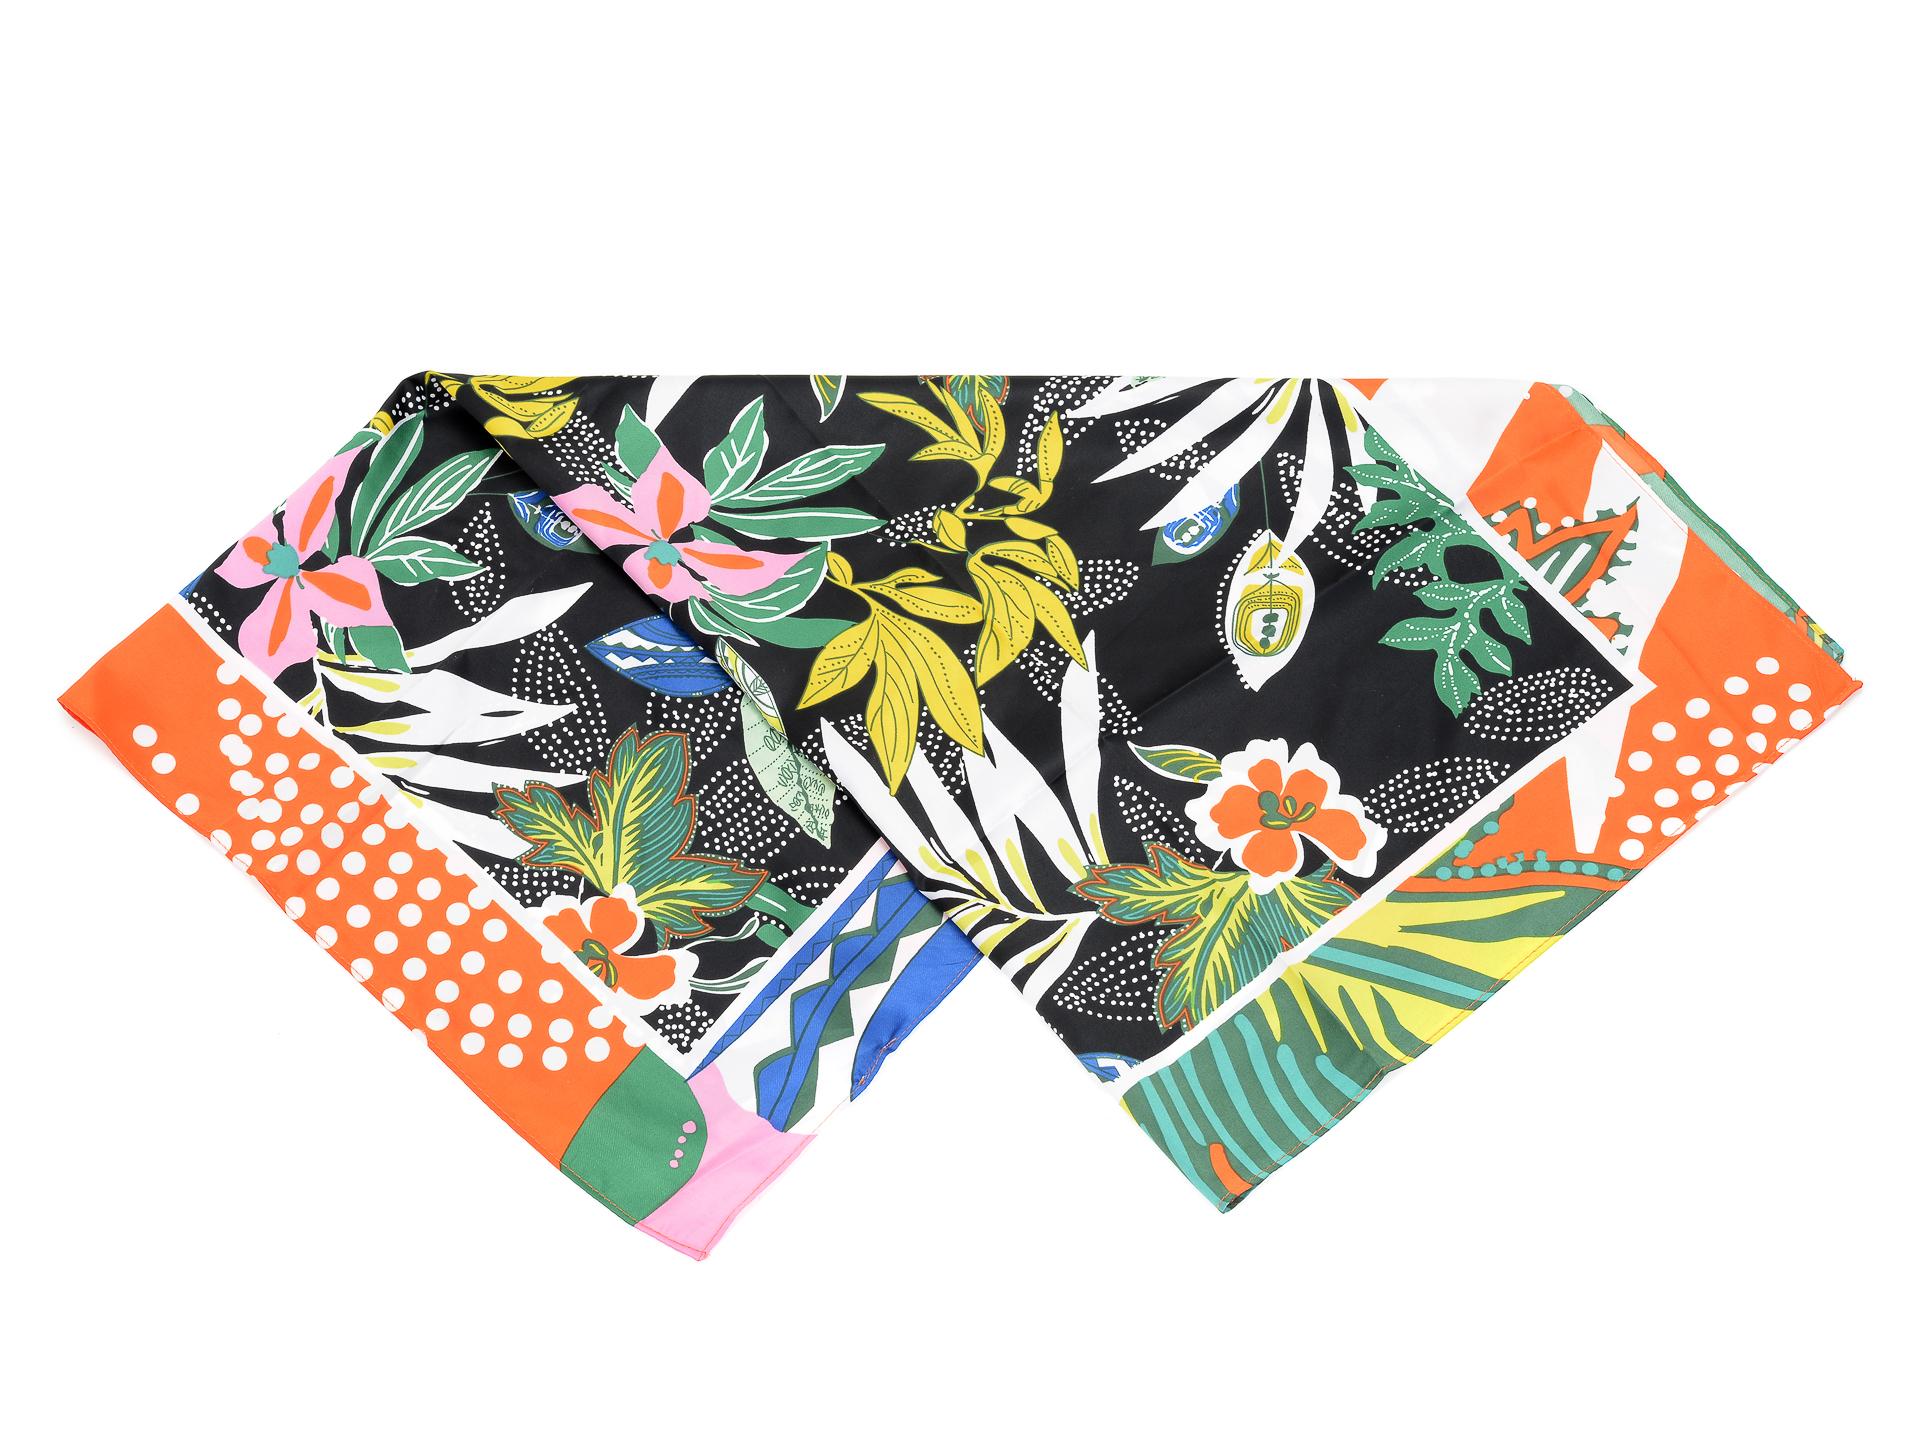 Esarfa ALDO multicolora, Aroona840, din material textil imagine